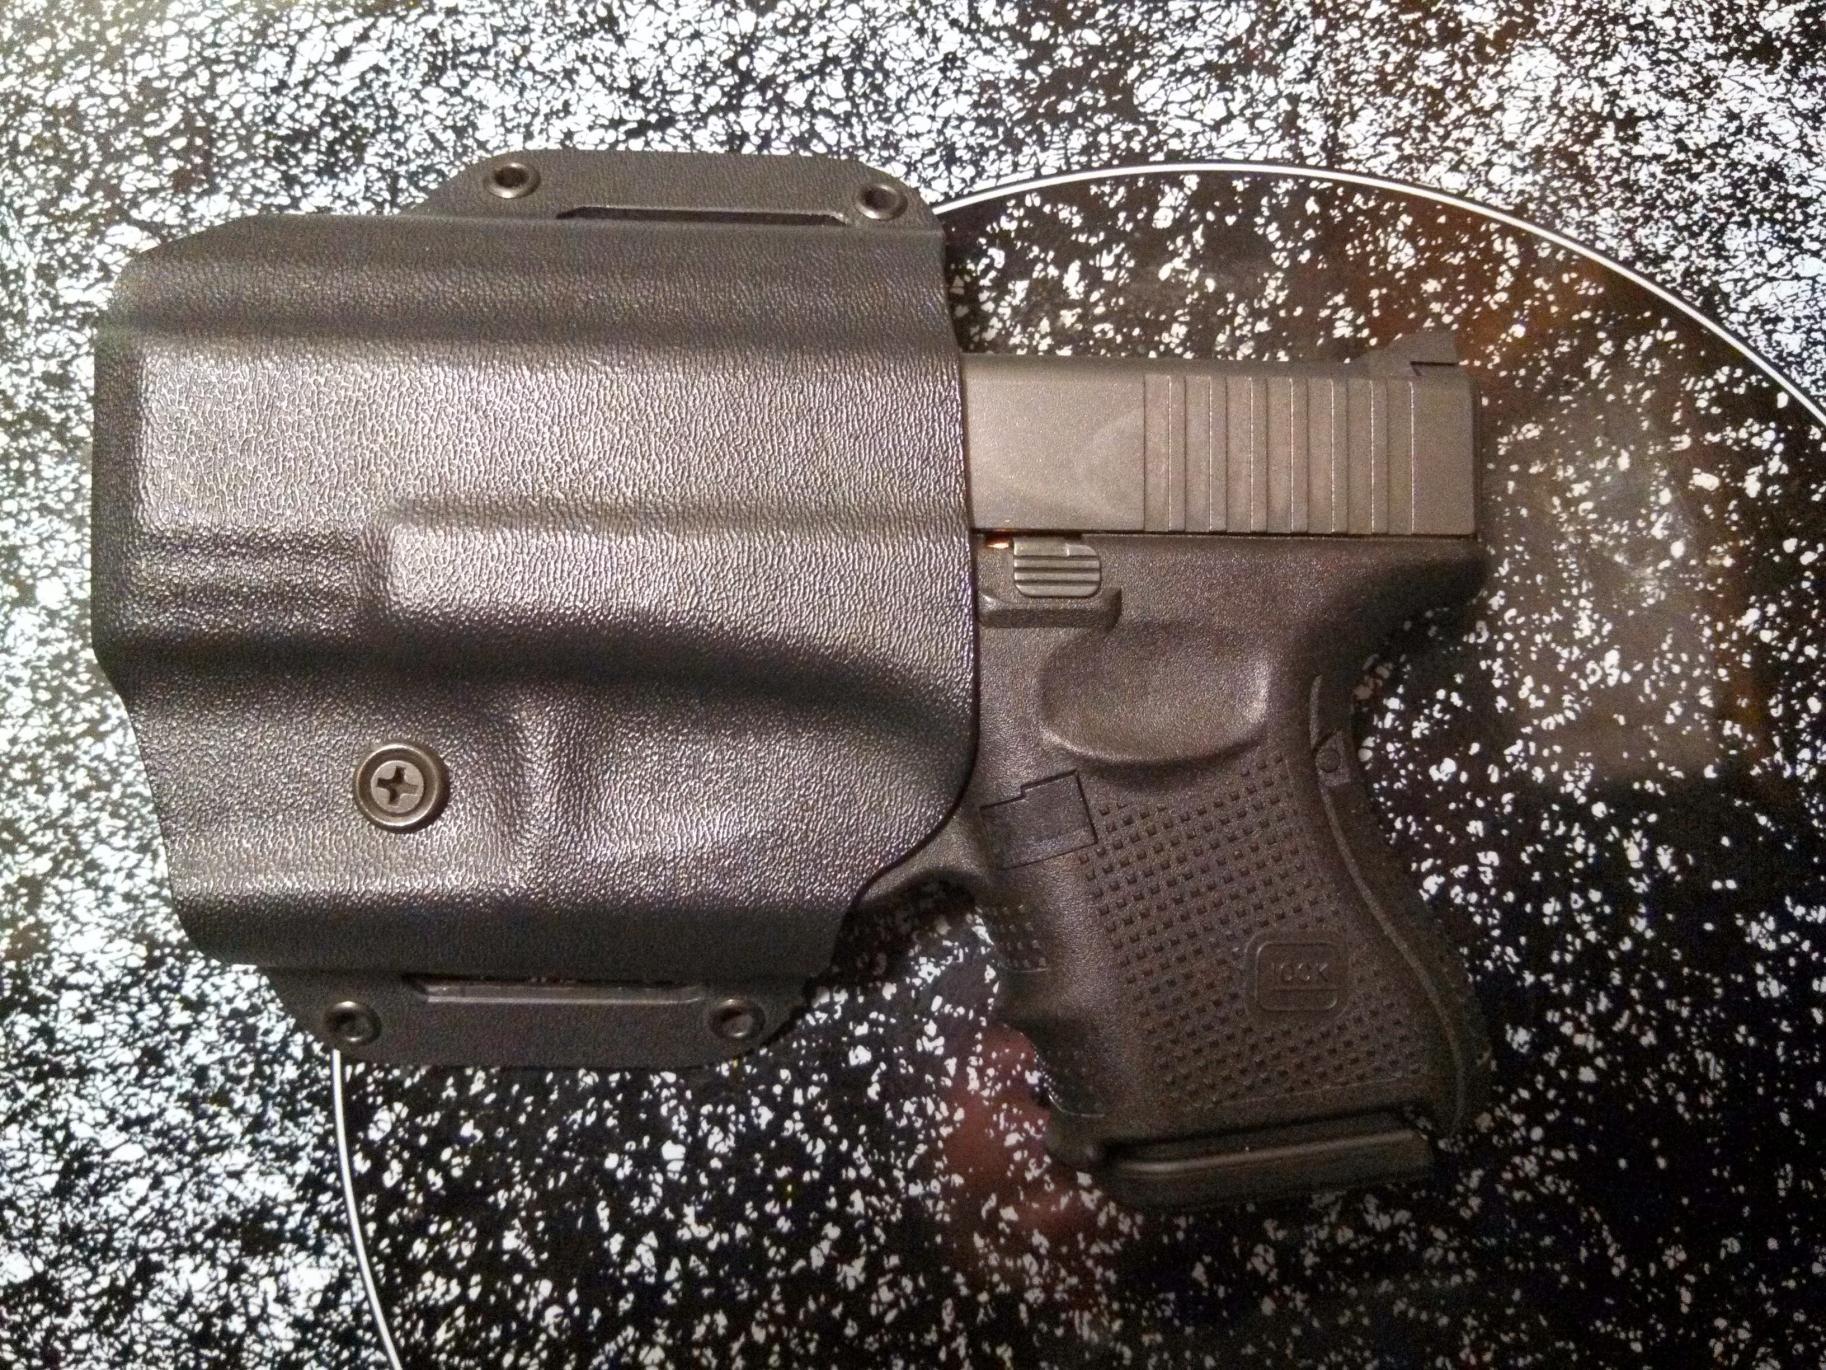 X-Concealment Glock Holster-img_20140121_231406_077.jpg